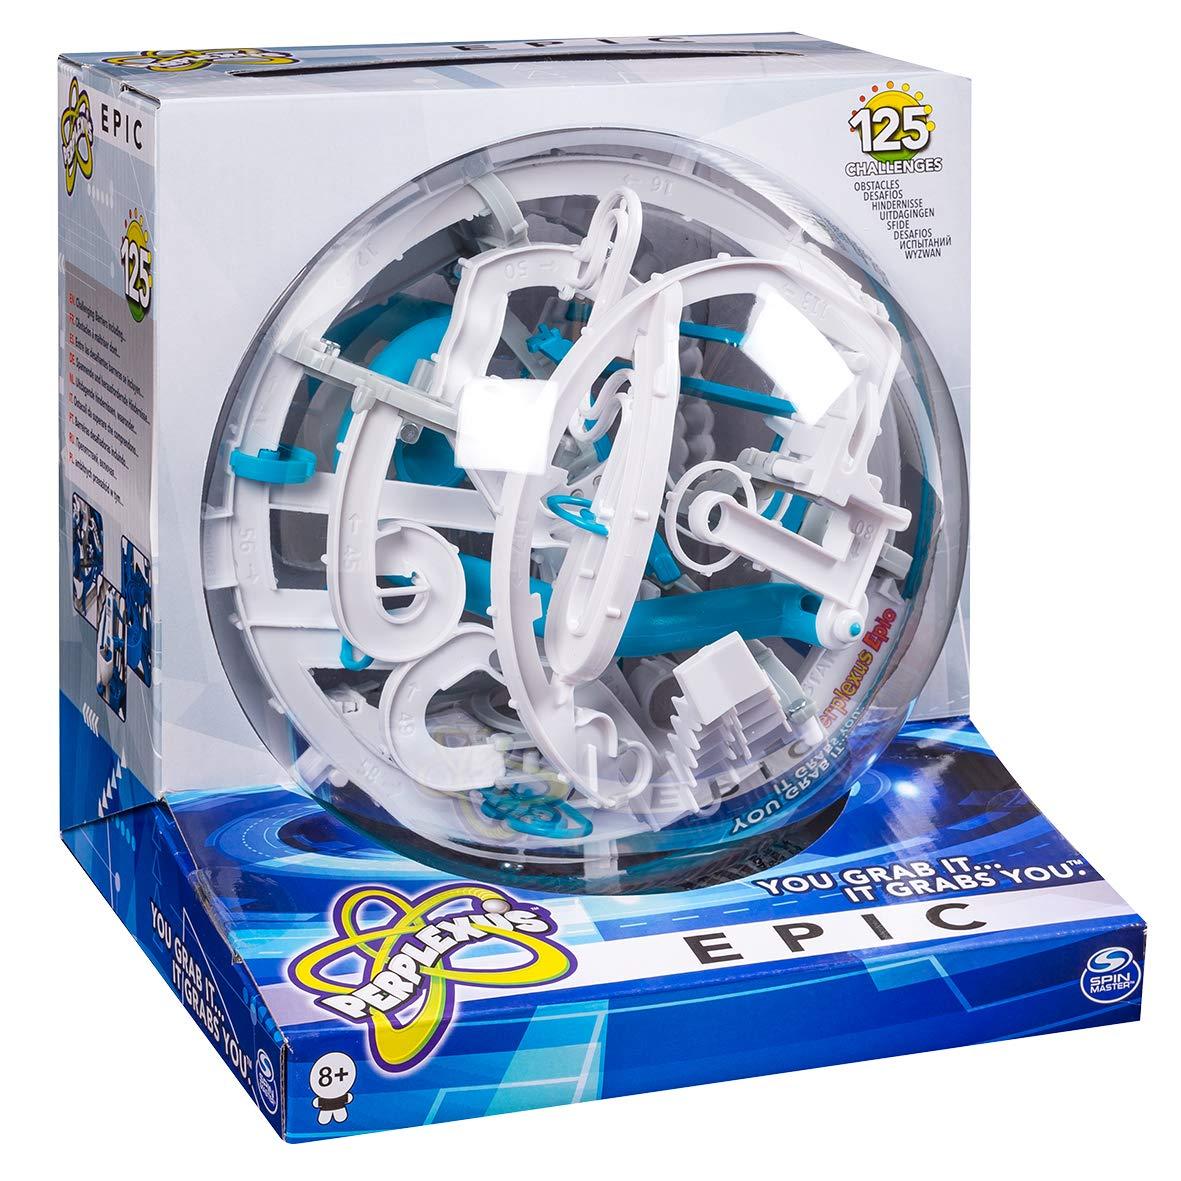 Perplexus Games Epic-Labirinto Tridimensionale, 6022080 Spin Master